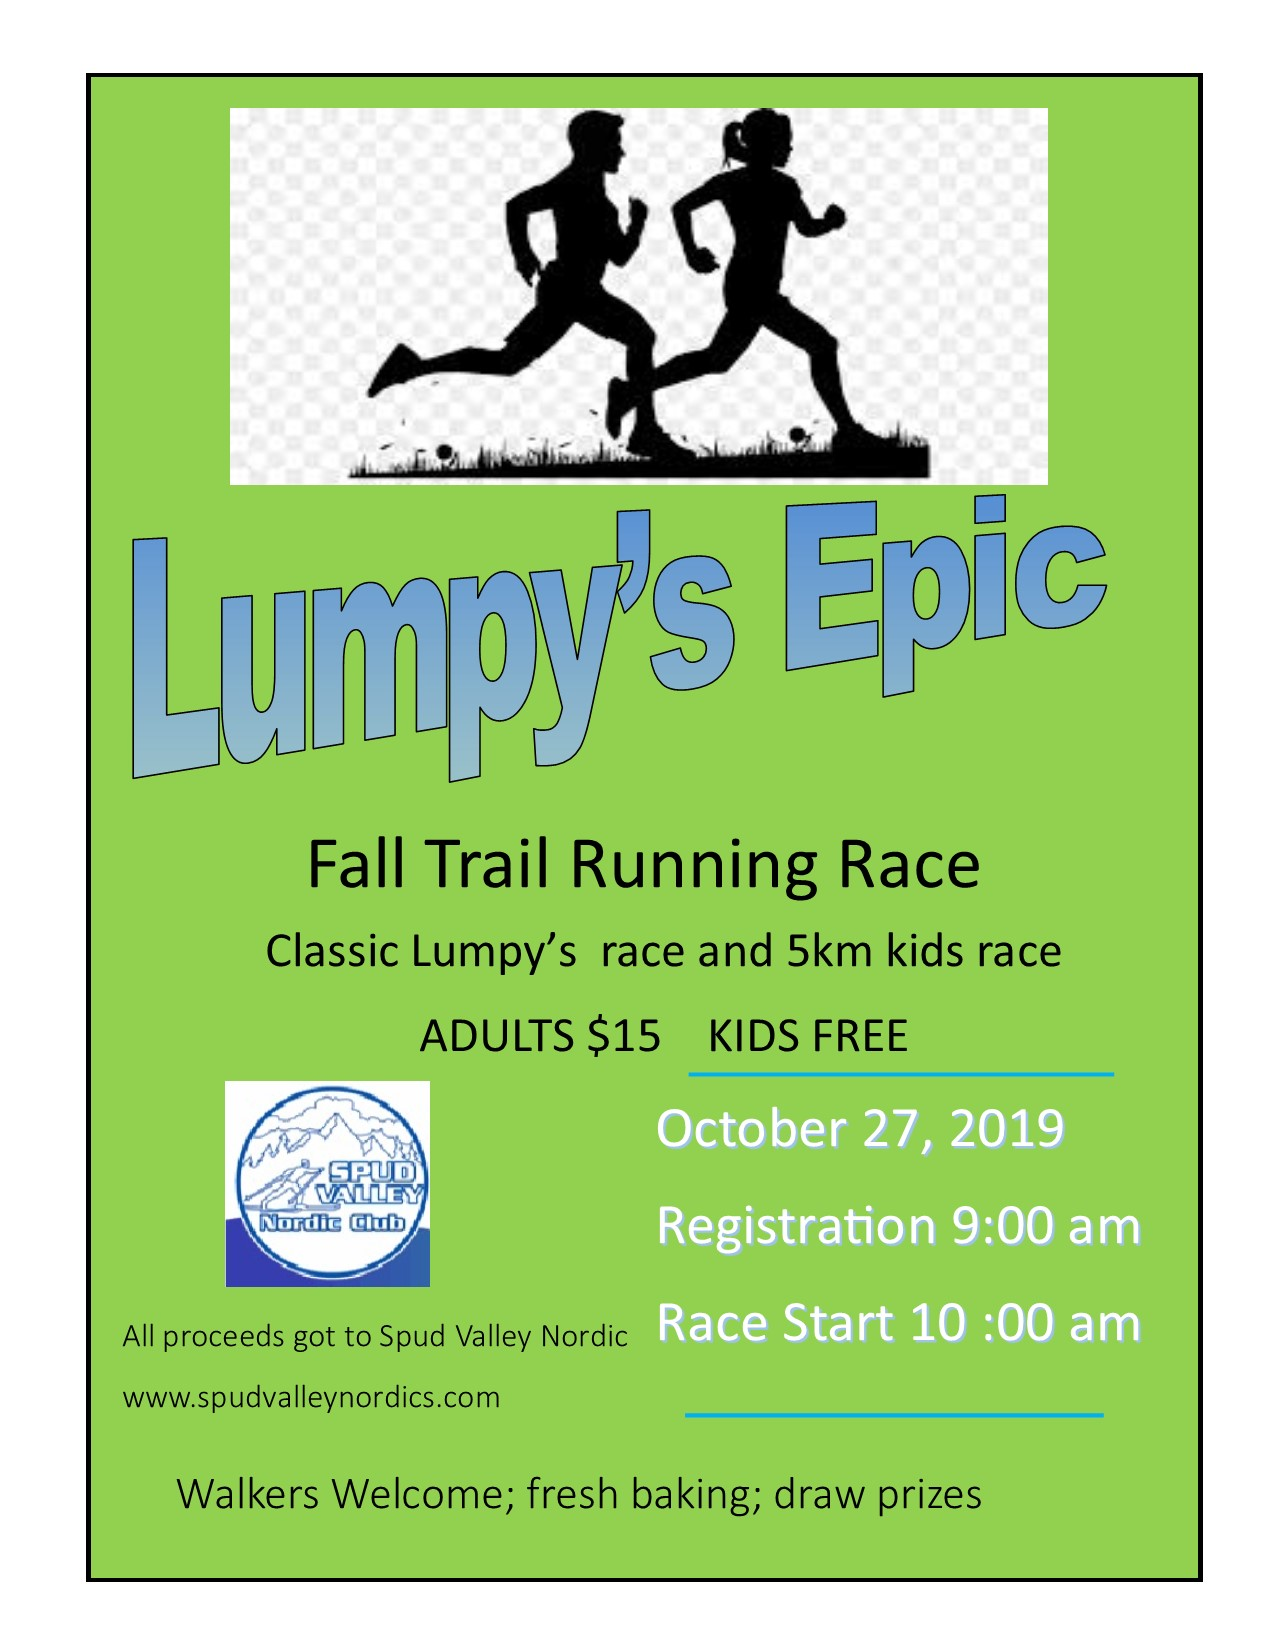 Lumpys Race correct